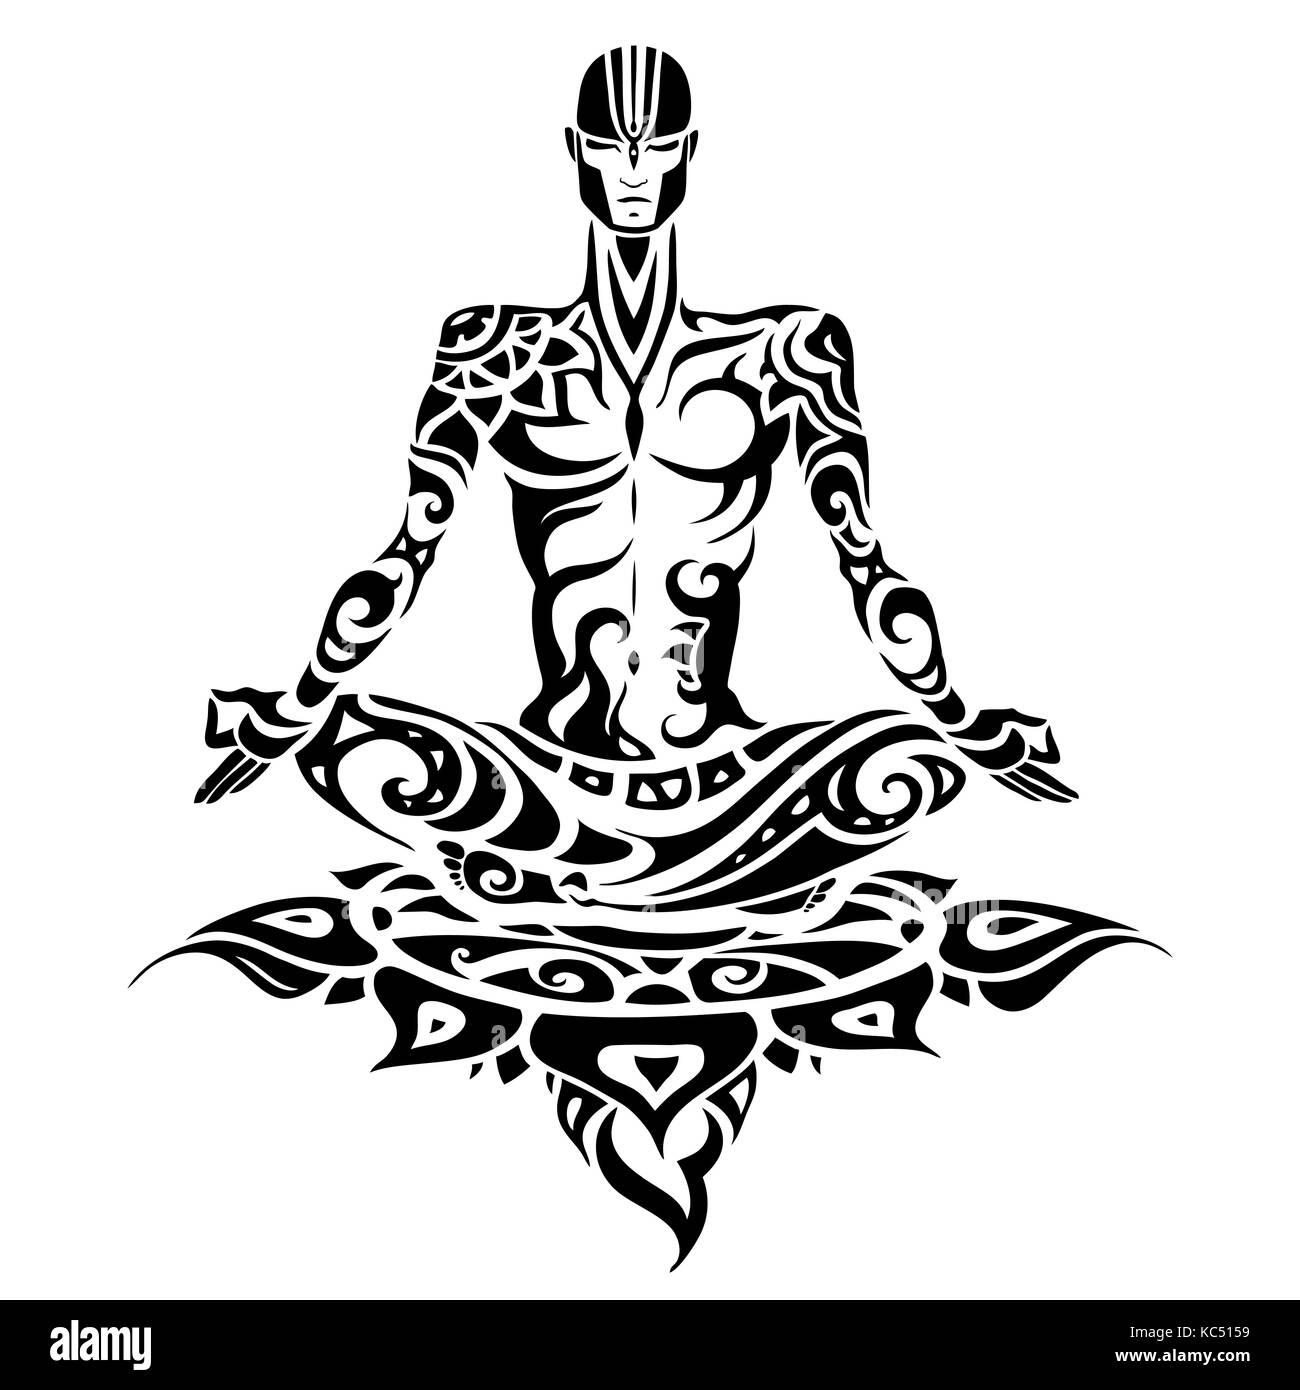 Meditation Yoga Man Silhouette Stock Vector Image Art Alamy